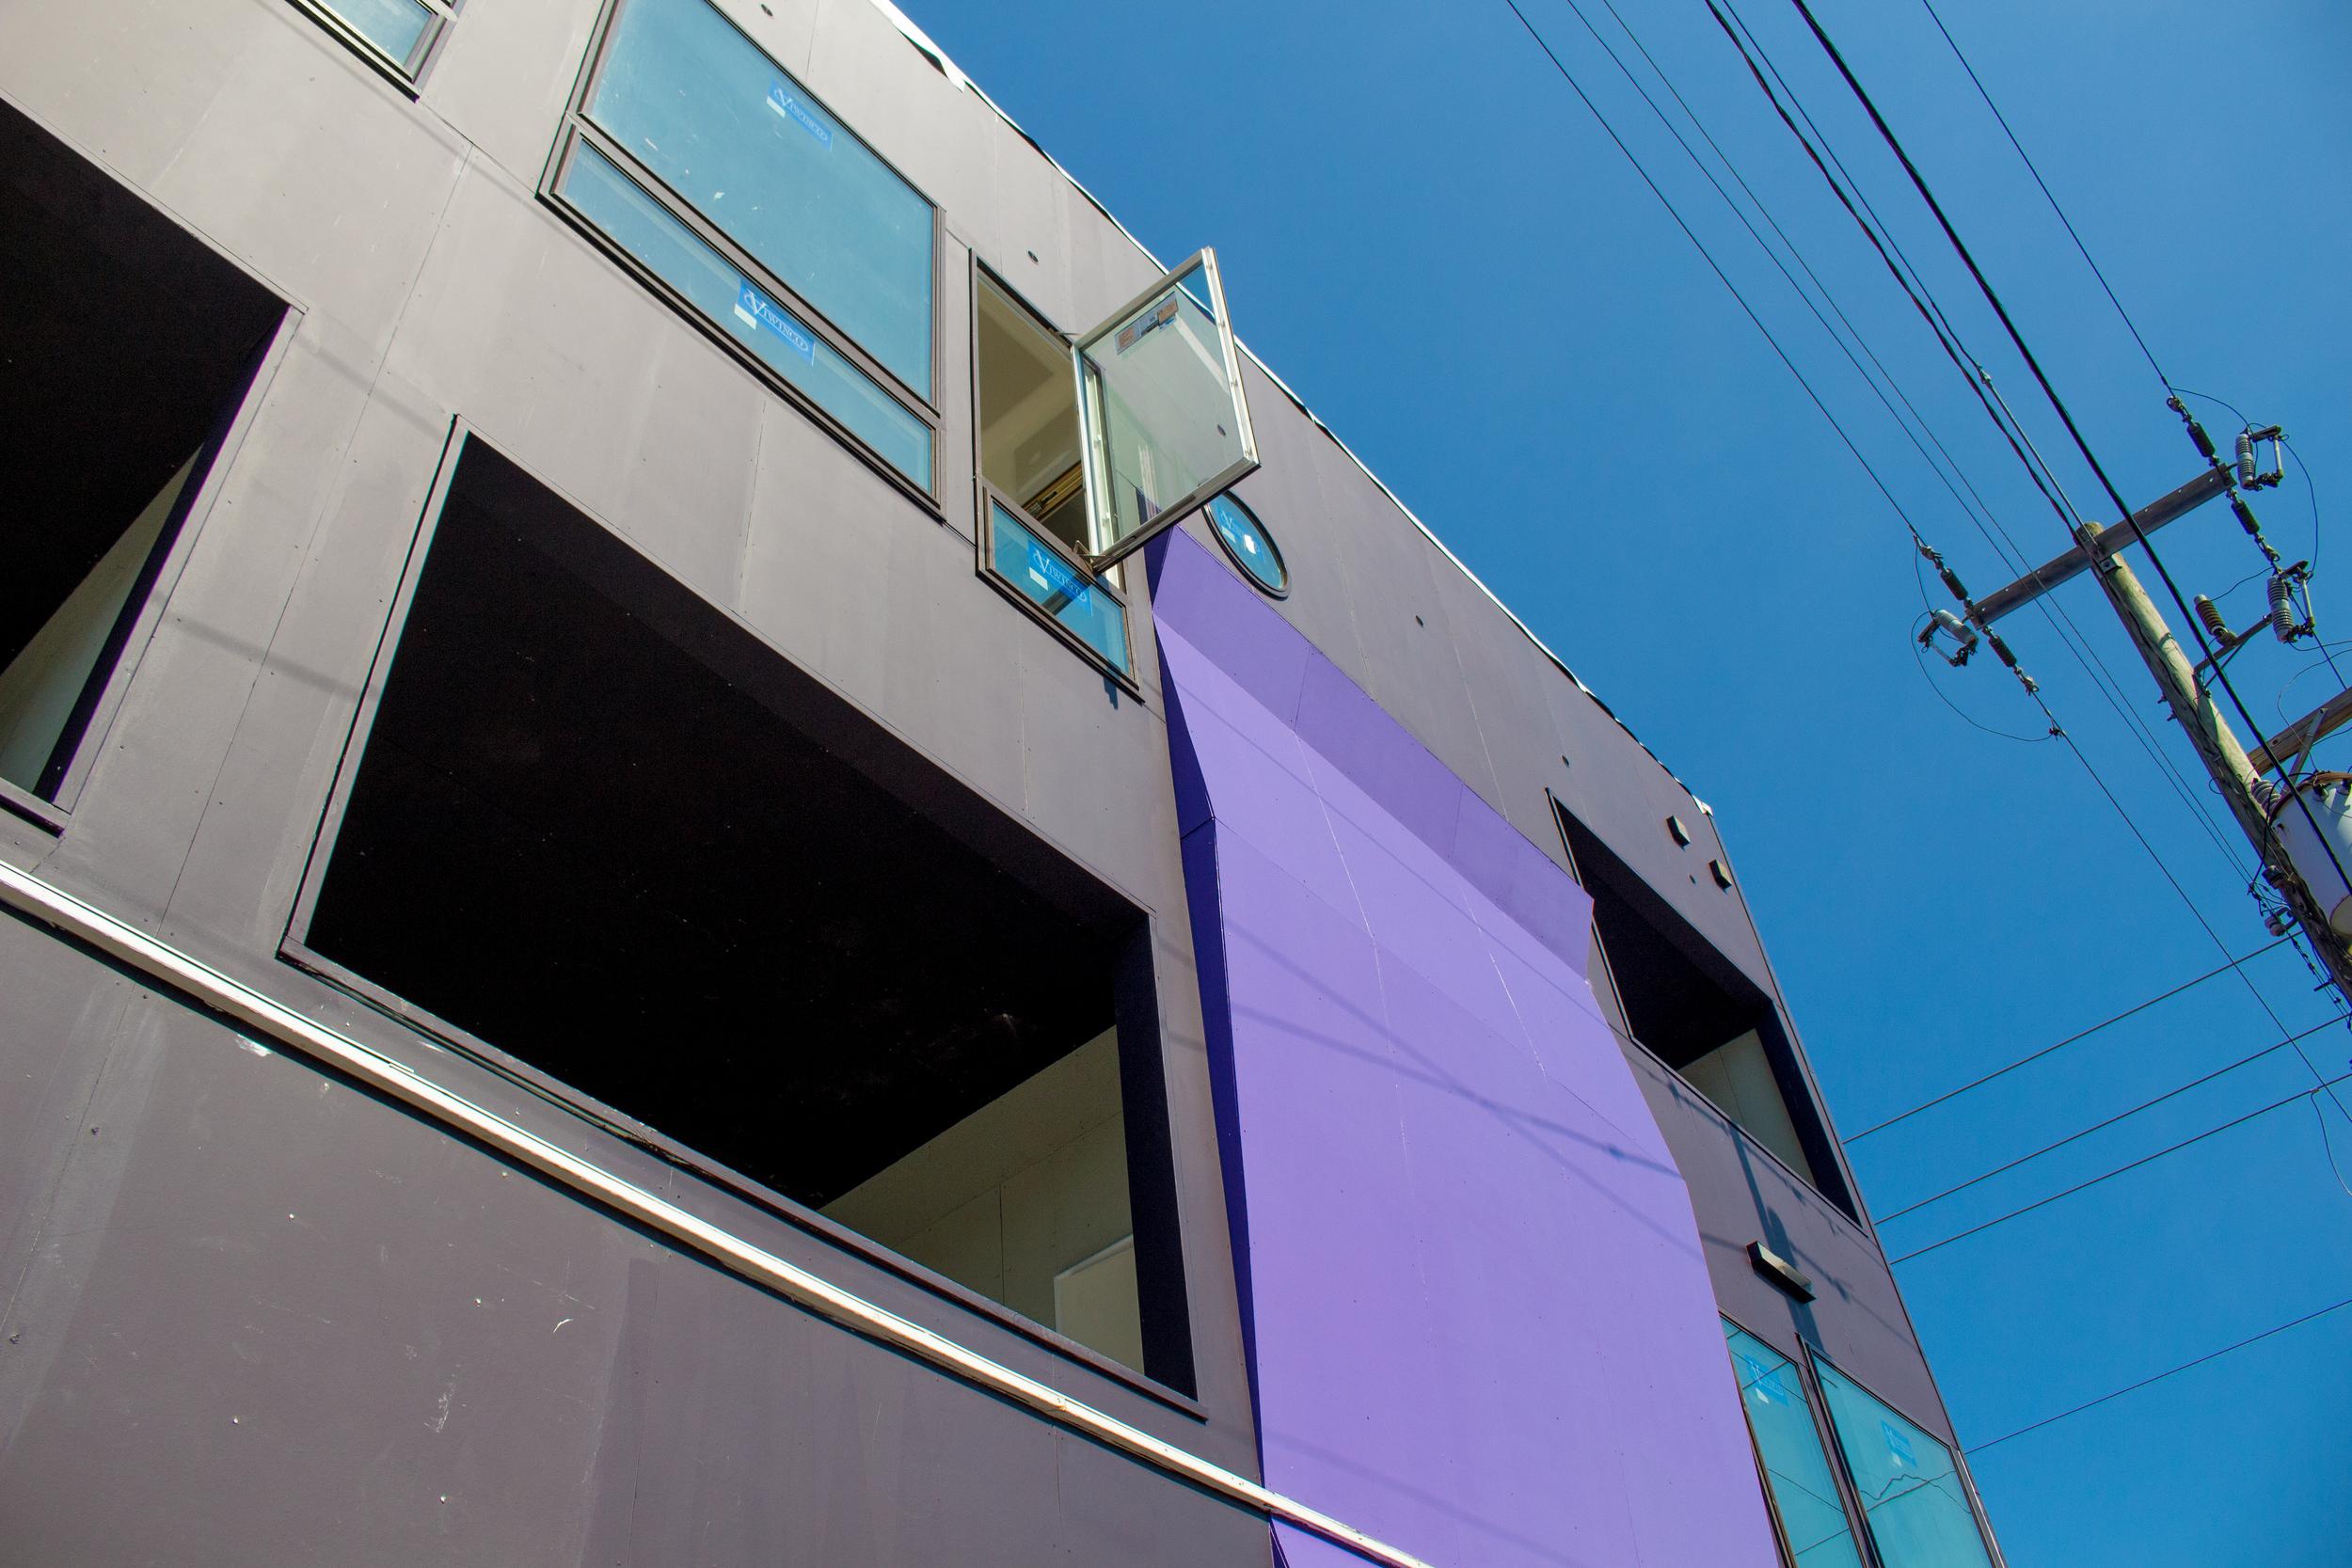 Rogue Window